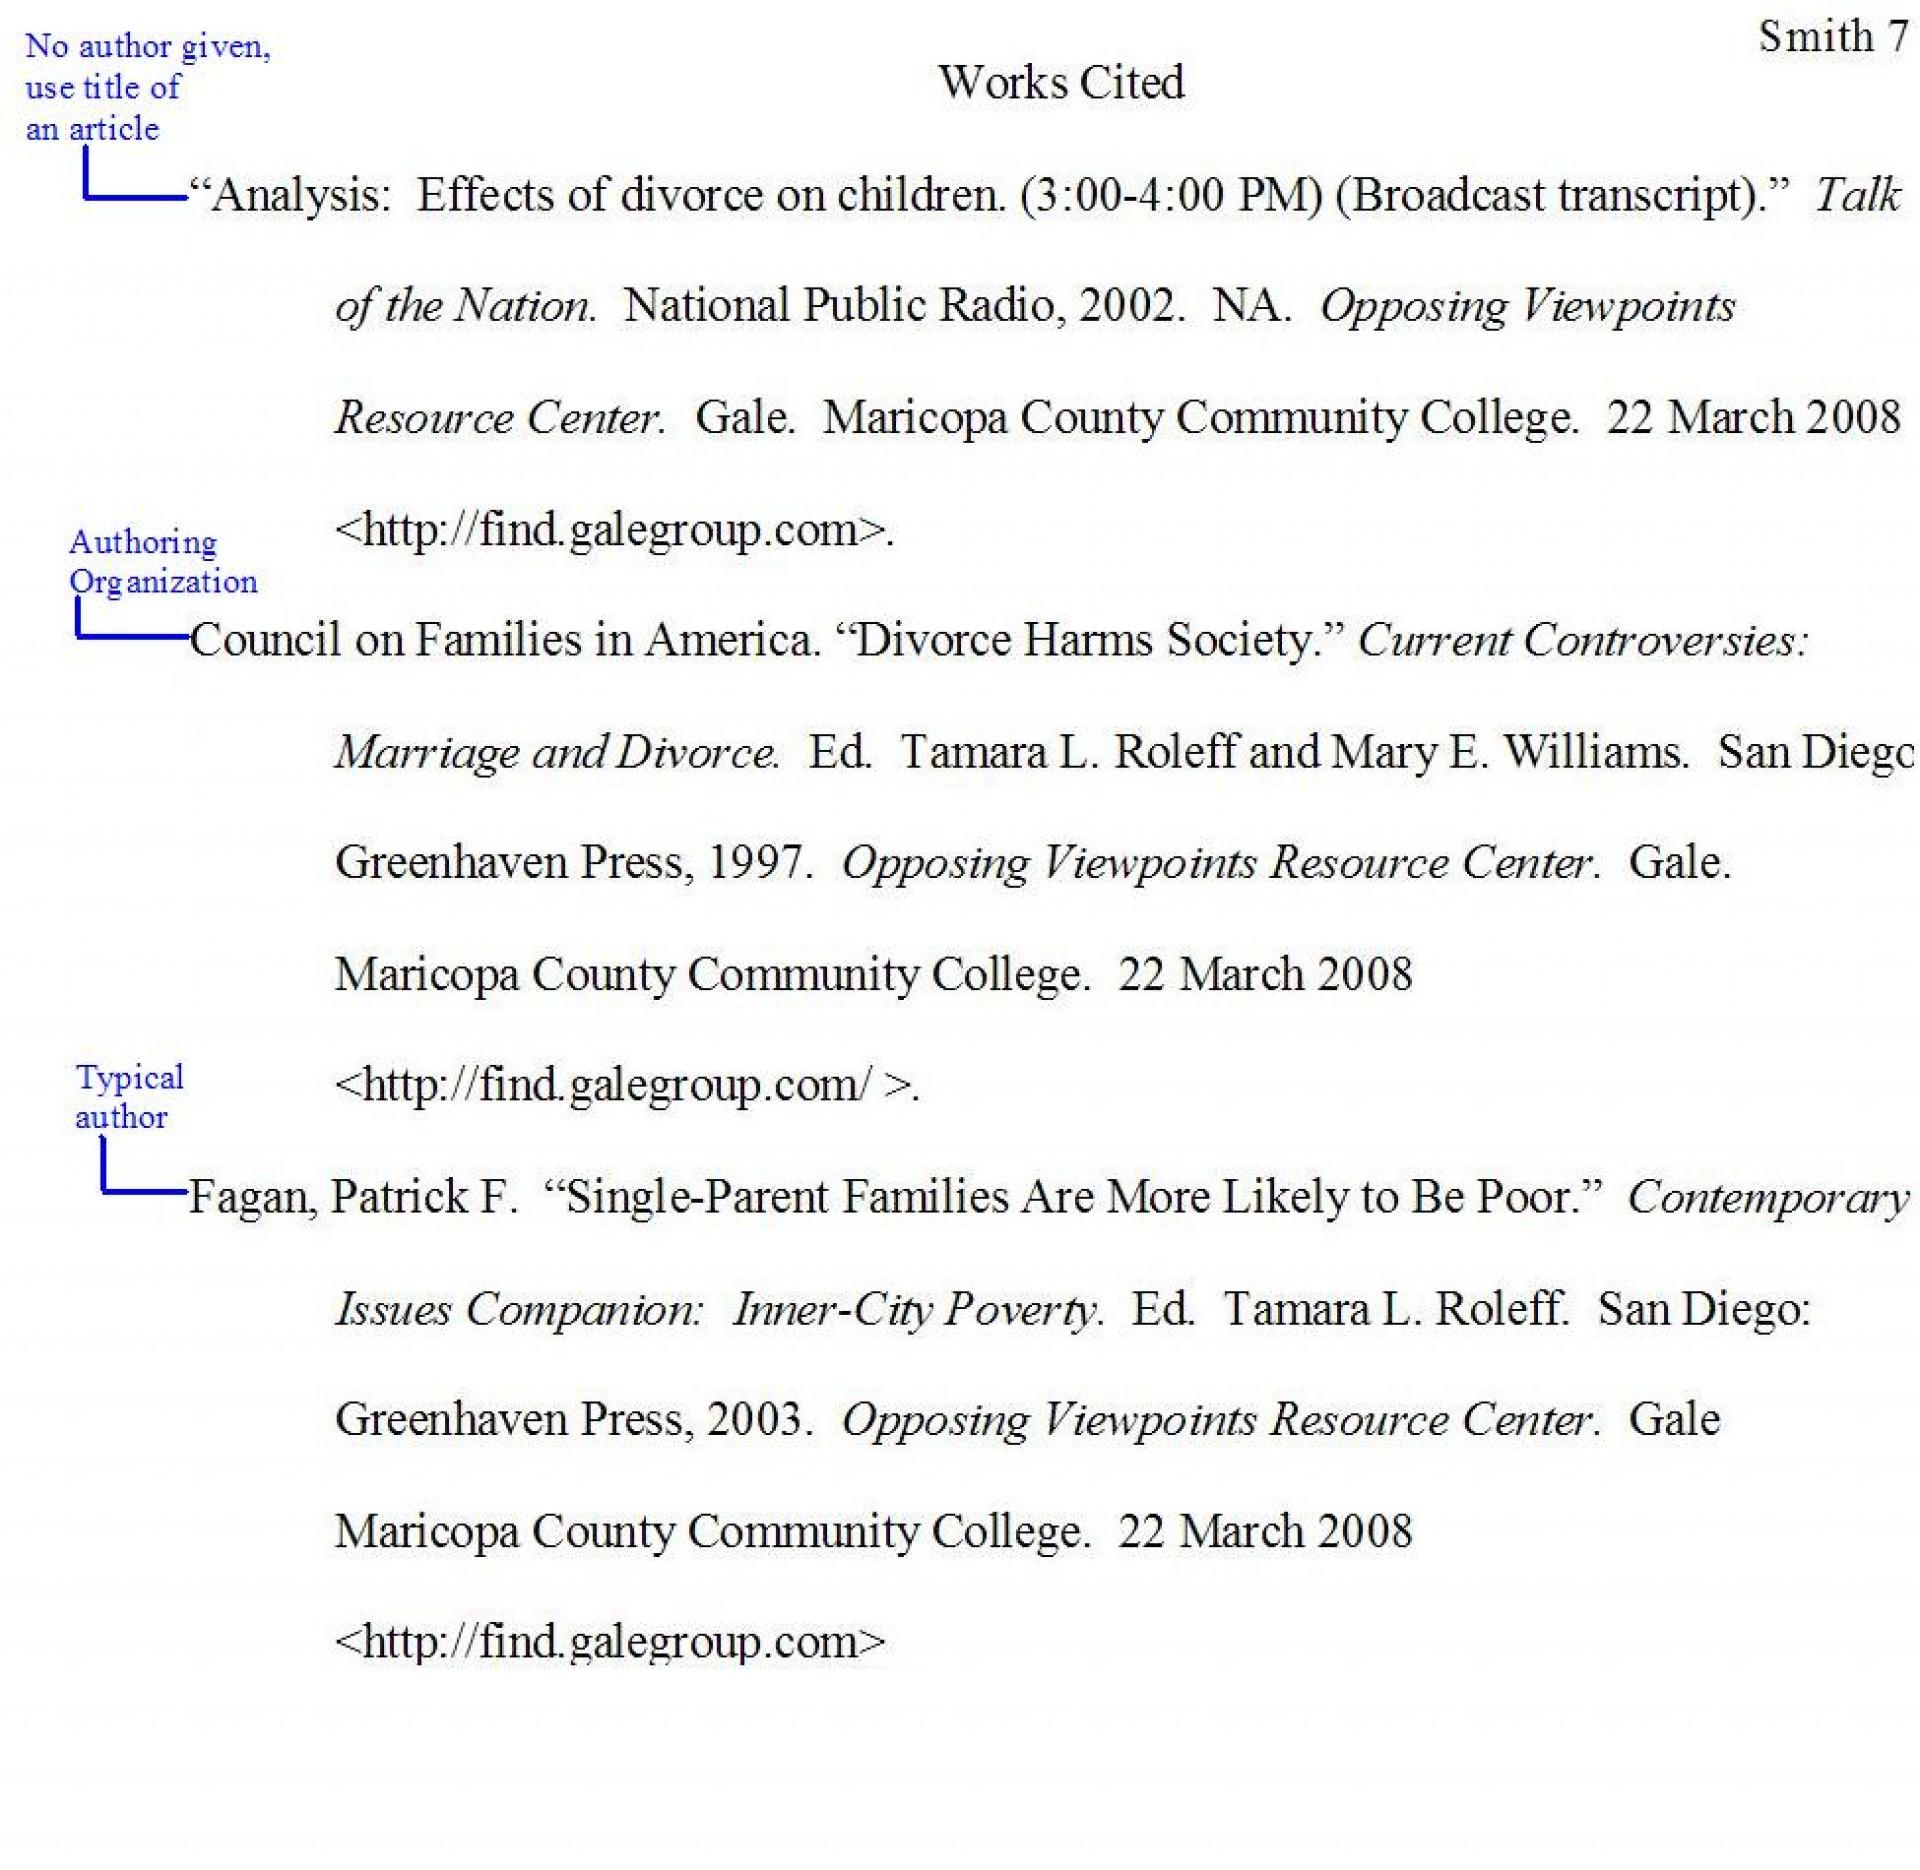 003 Samplewrkctd Jpg Essay Citation Dreaded Tok Format Apa In Text Movie Two Authors 1920